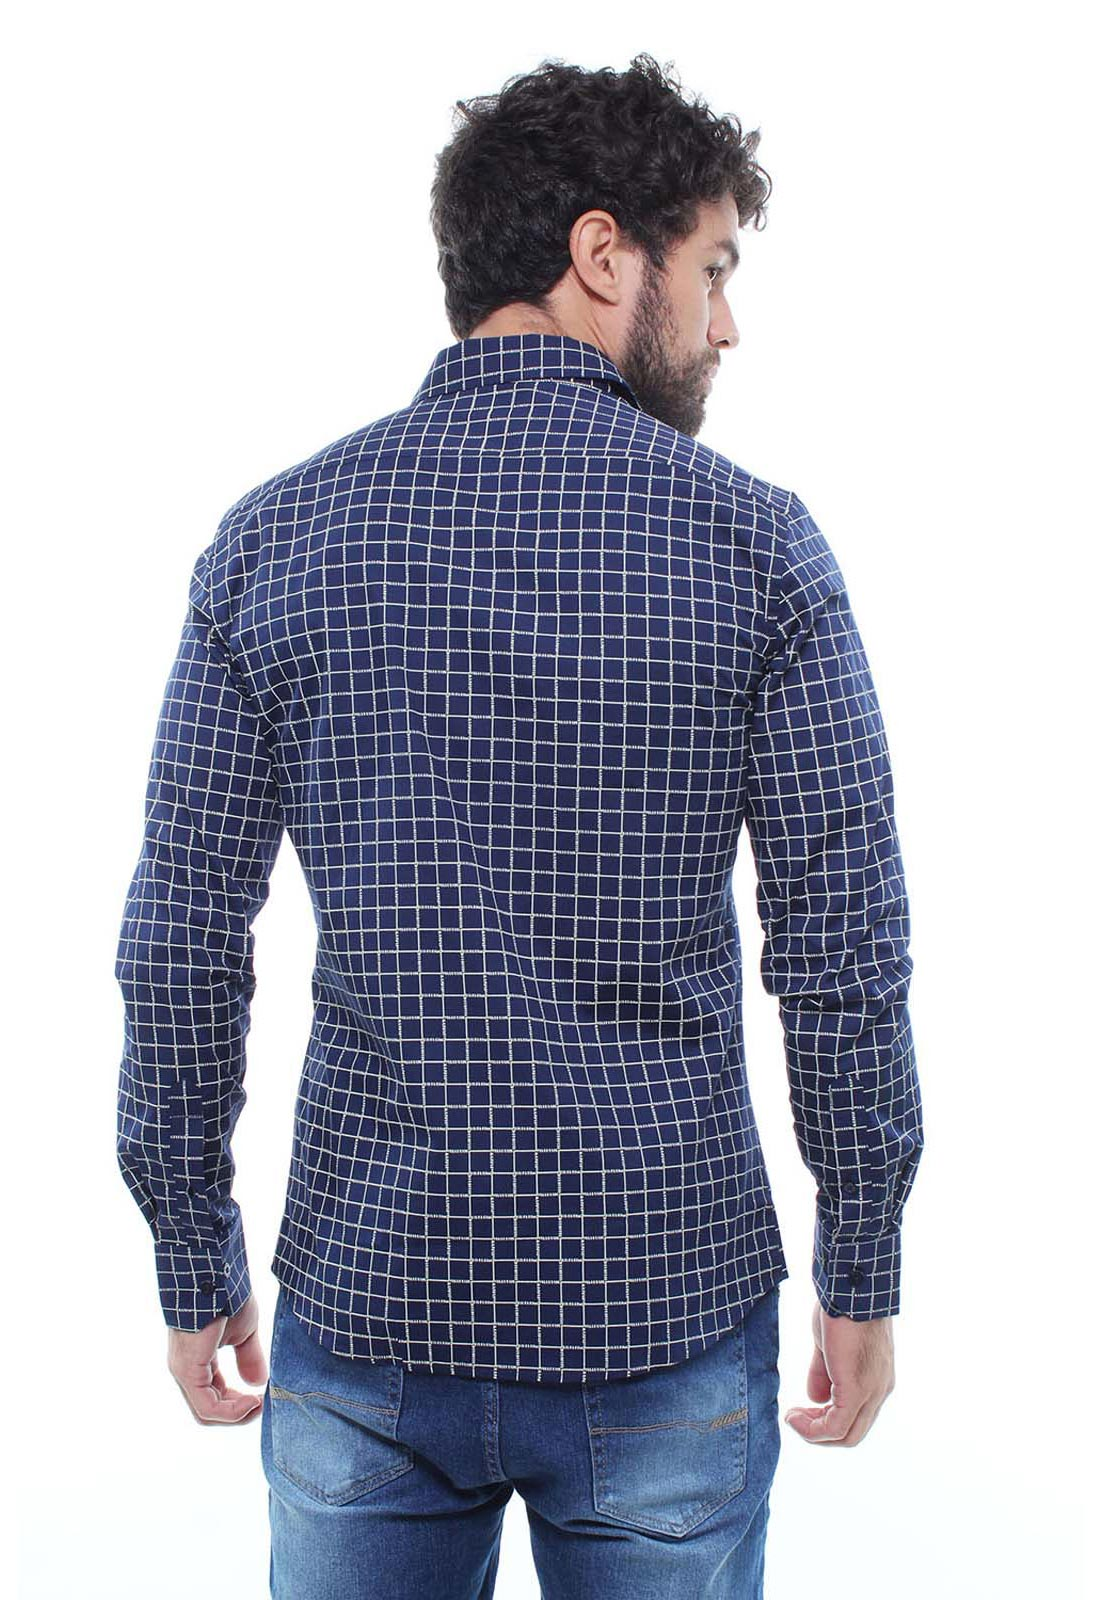 Camisa Estampada Masculina Manga Longa Crocker - 47162  - CROCKER JEANS